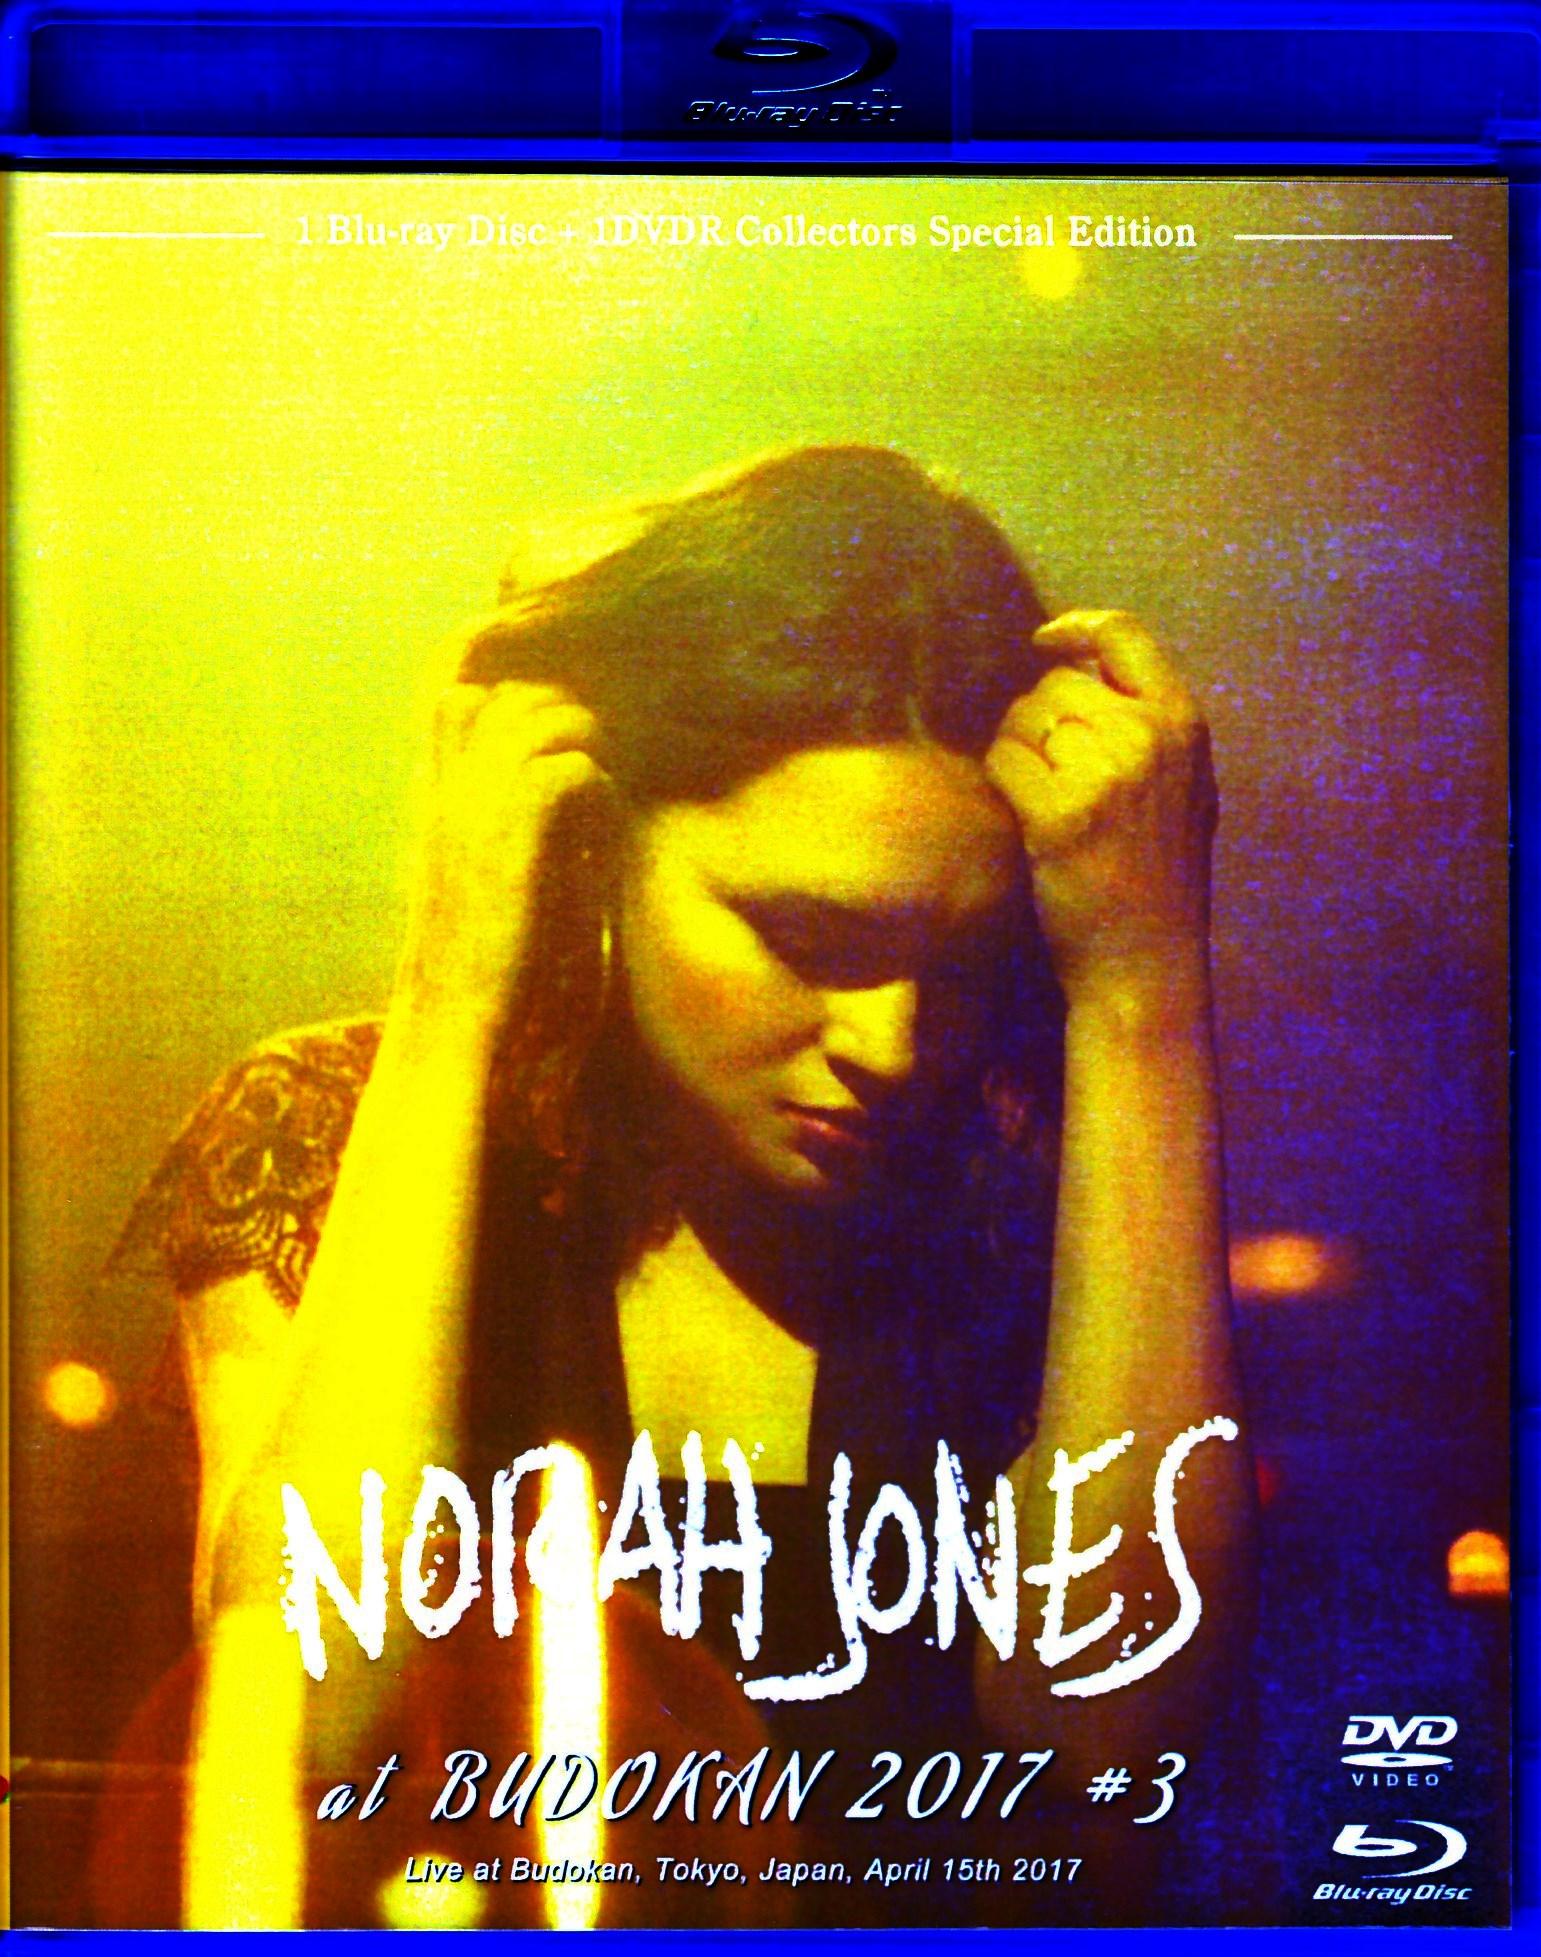 Norah Jones ノラ・ジョーンズ/Tokyo,Japan 4.15.2017 DVD & Blu-Ray Ver.